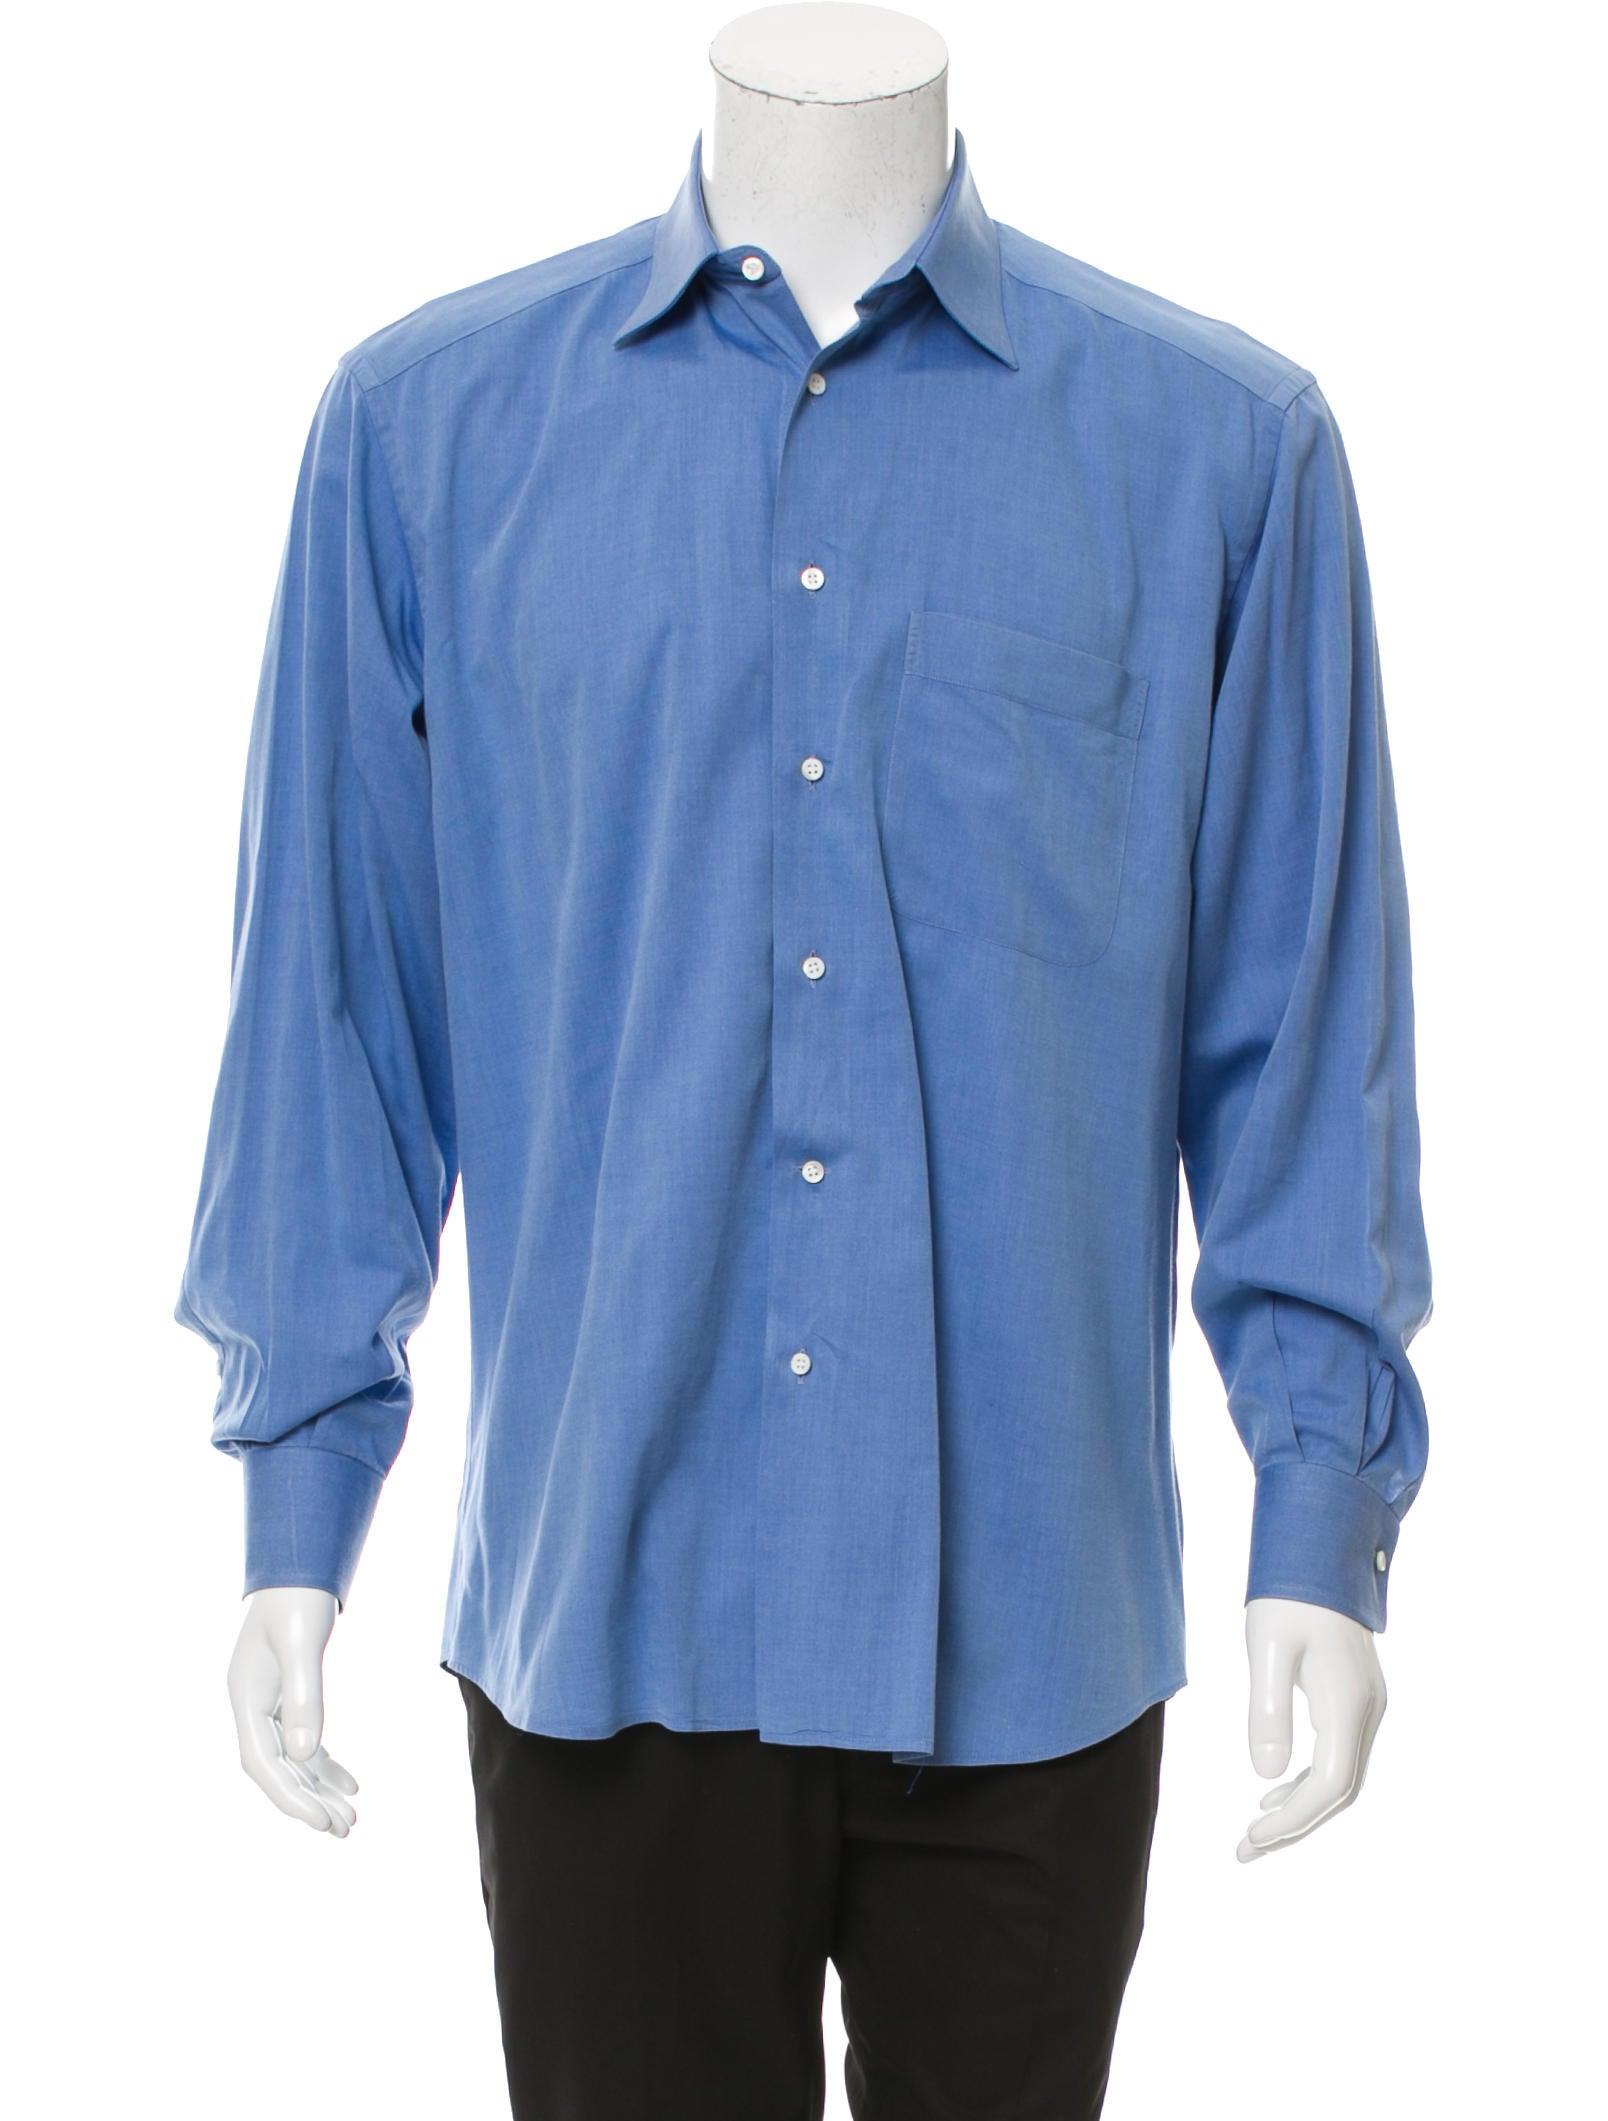 ermenegildo zegna woven button up shirt clothing zgn25234 the realreal. Black Bedroom Furniture Sets. Home Design Ideas